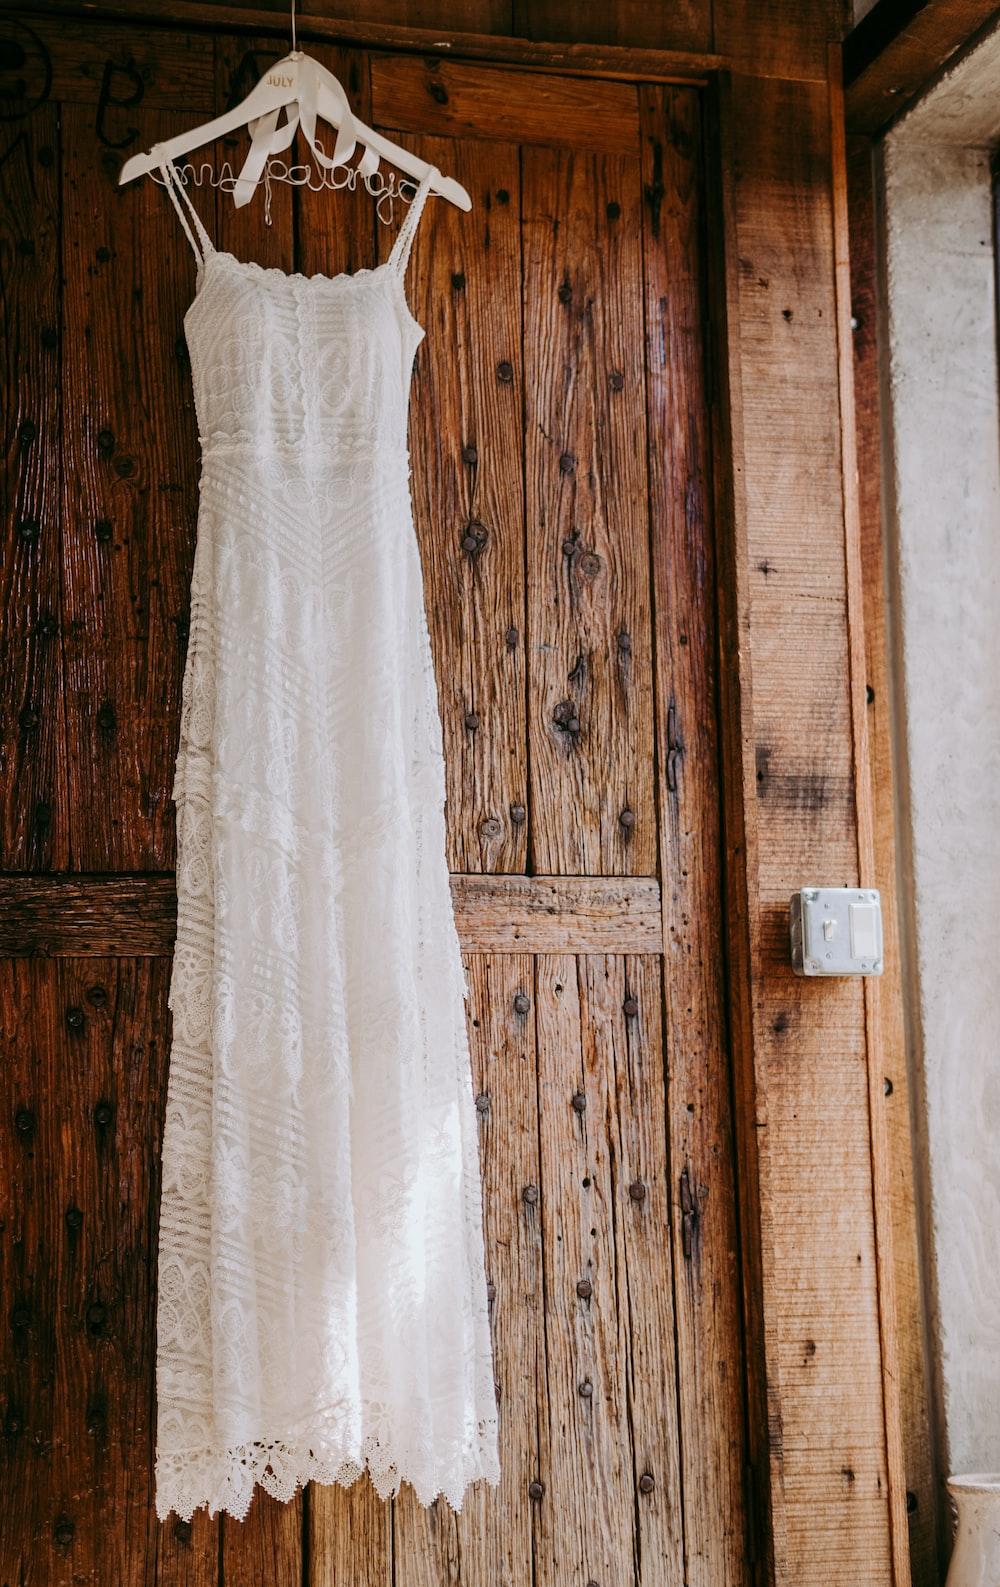 white sleeveless dress near brown wooden door